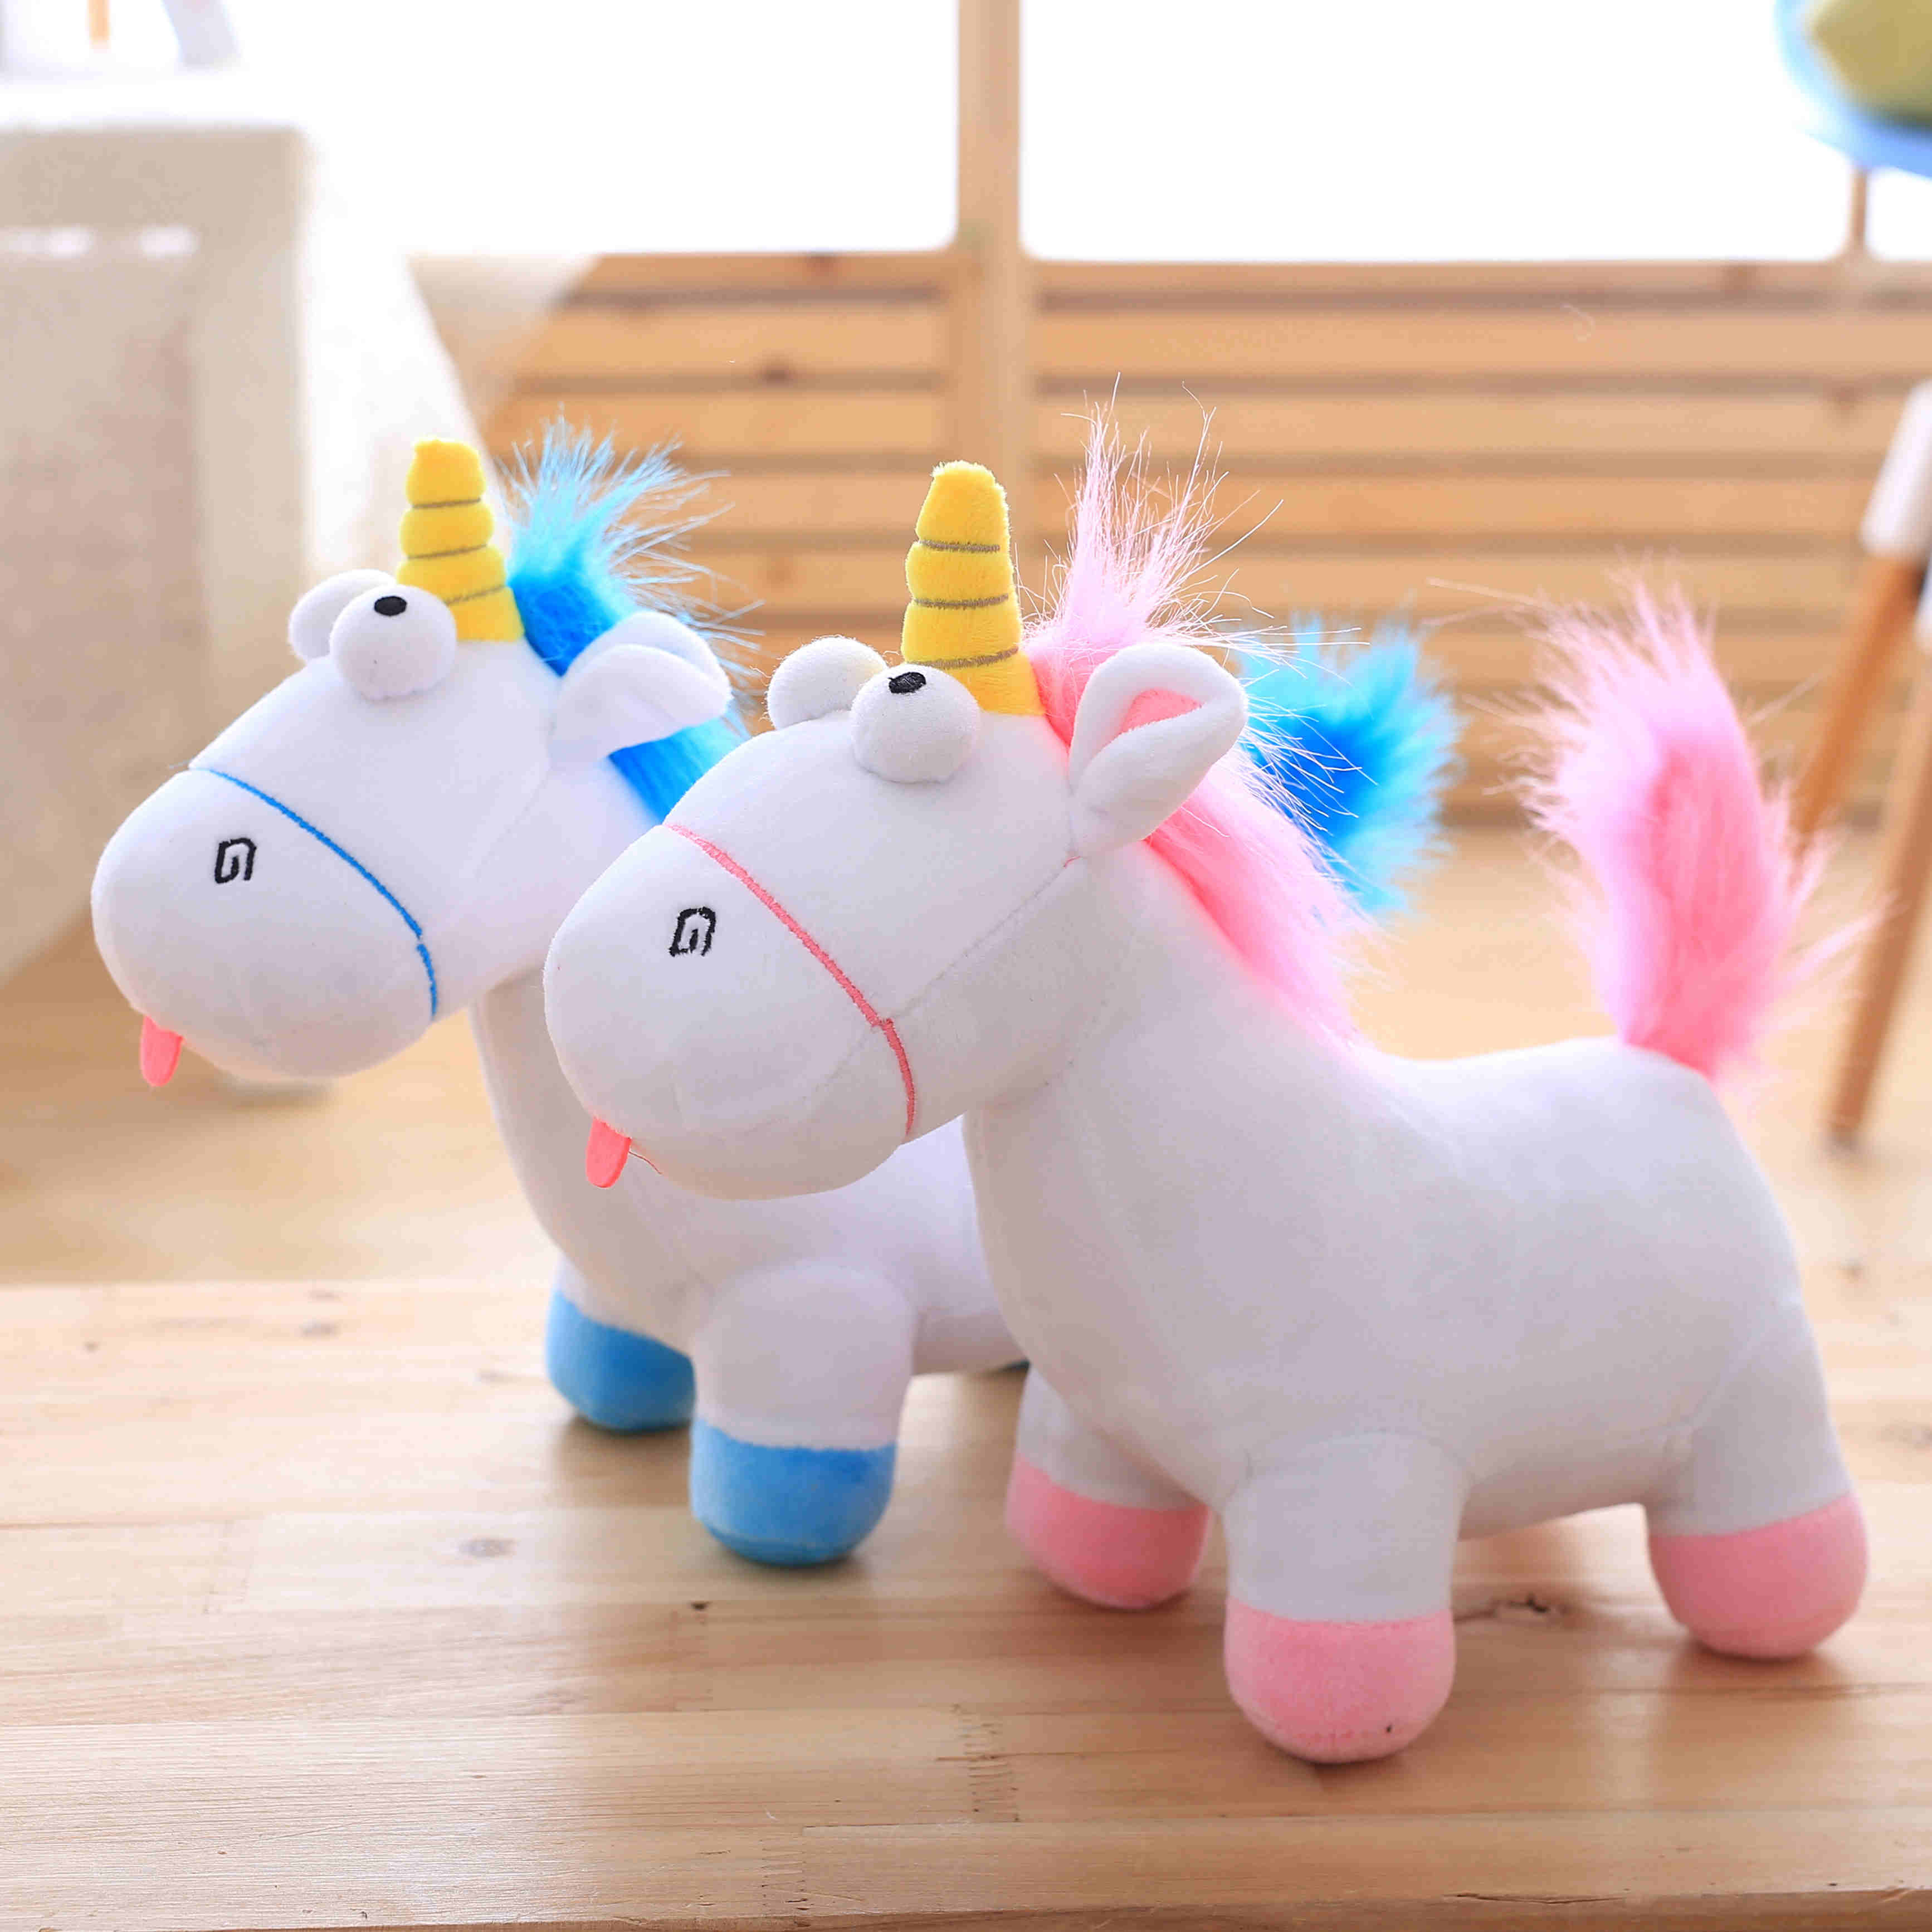 35cm Lovely Plush Unicorn Horse Dolls Stuffed Unicorn Plush Toys Gift for Kids Home Decor Cartoon Horse Toys 40cm new lovely mickey mouse and minnie mouse plush toys stuffed cartoon figure dolls kids christmas birthday gift